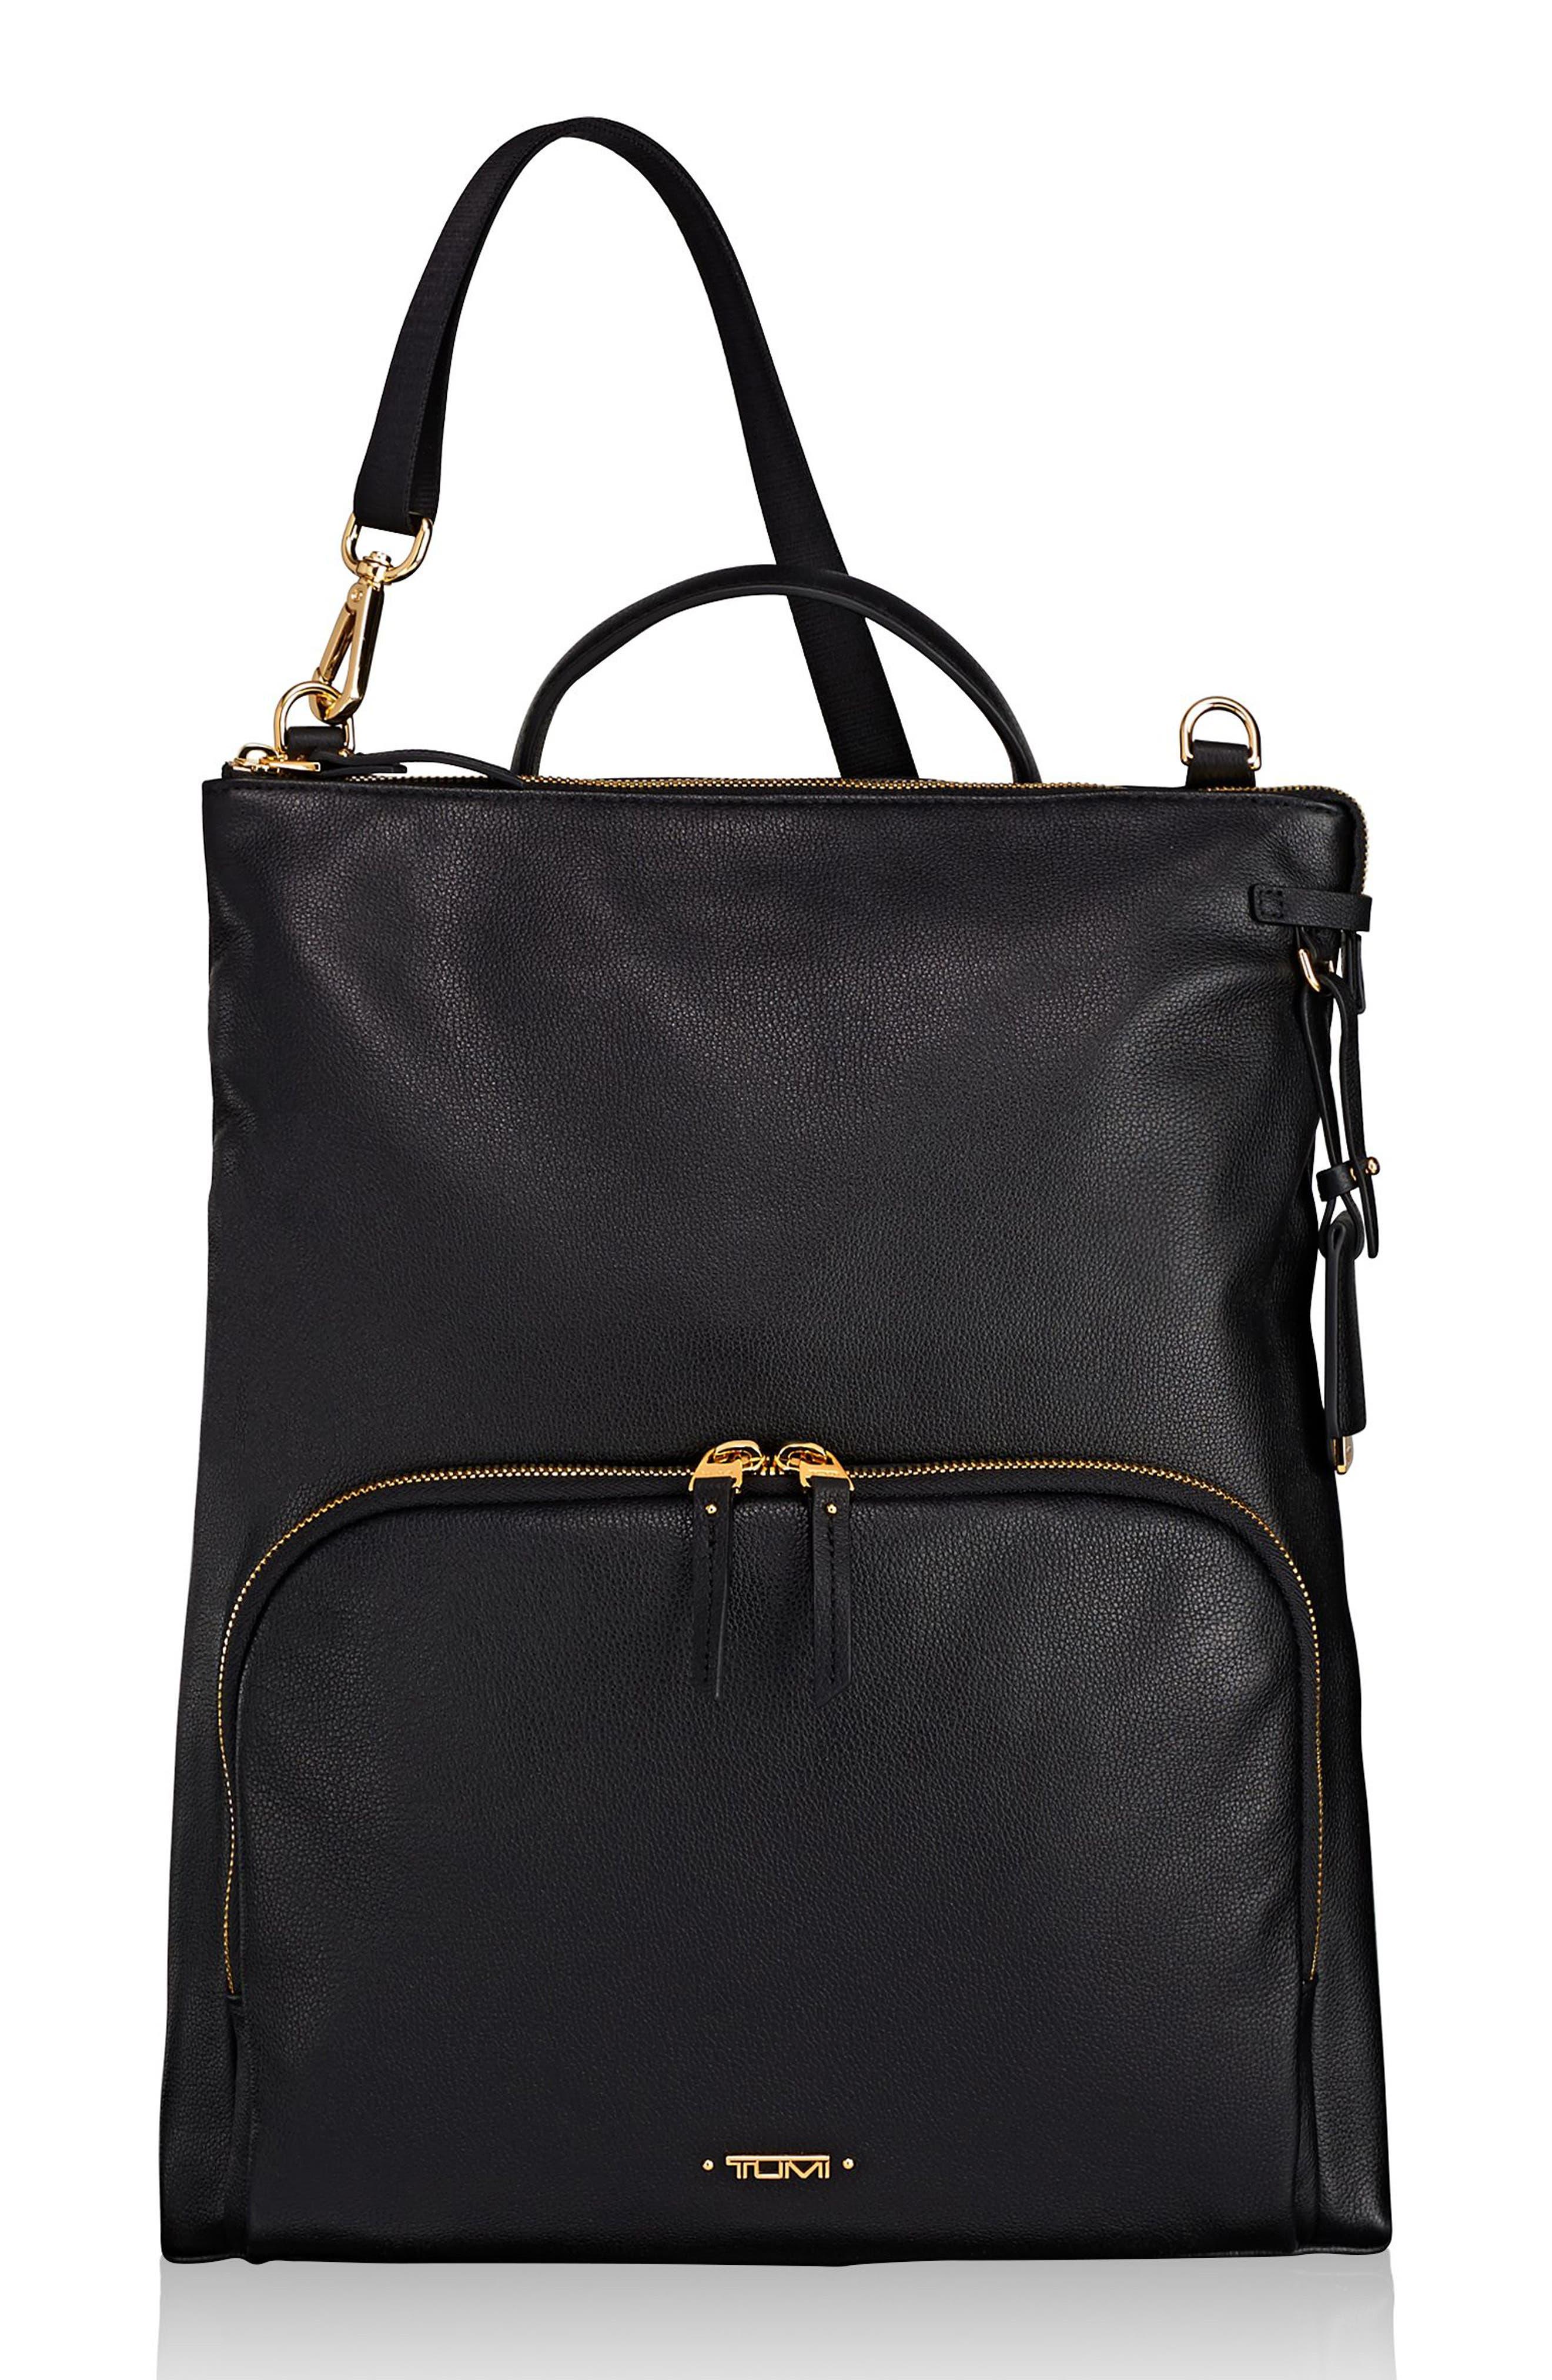 Tumi Voyageur - Jackie Convertible Crossbody Bag - Black  da88ca0bbca36